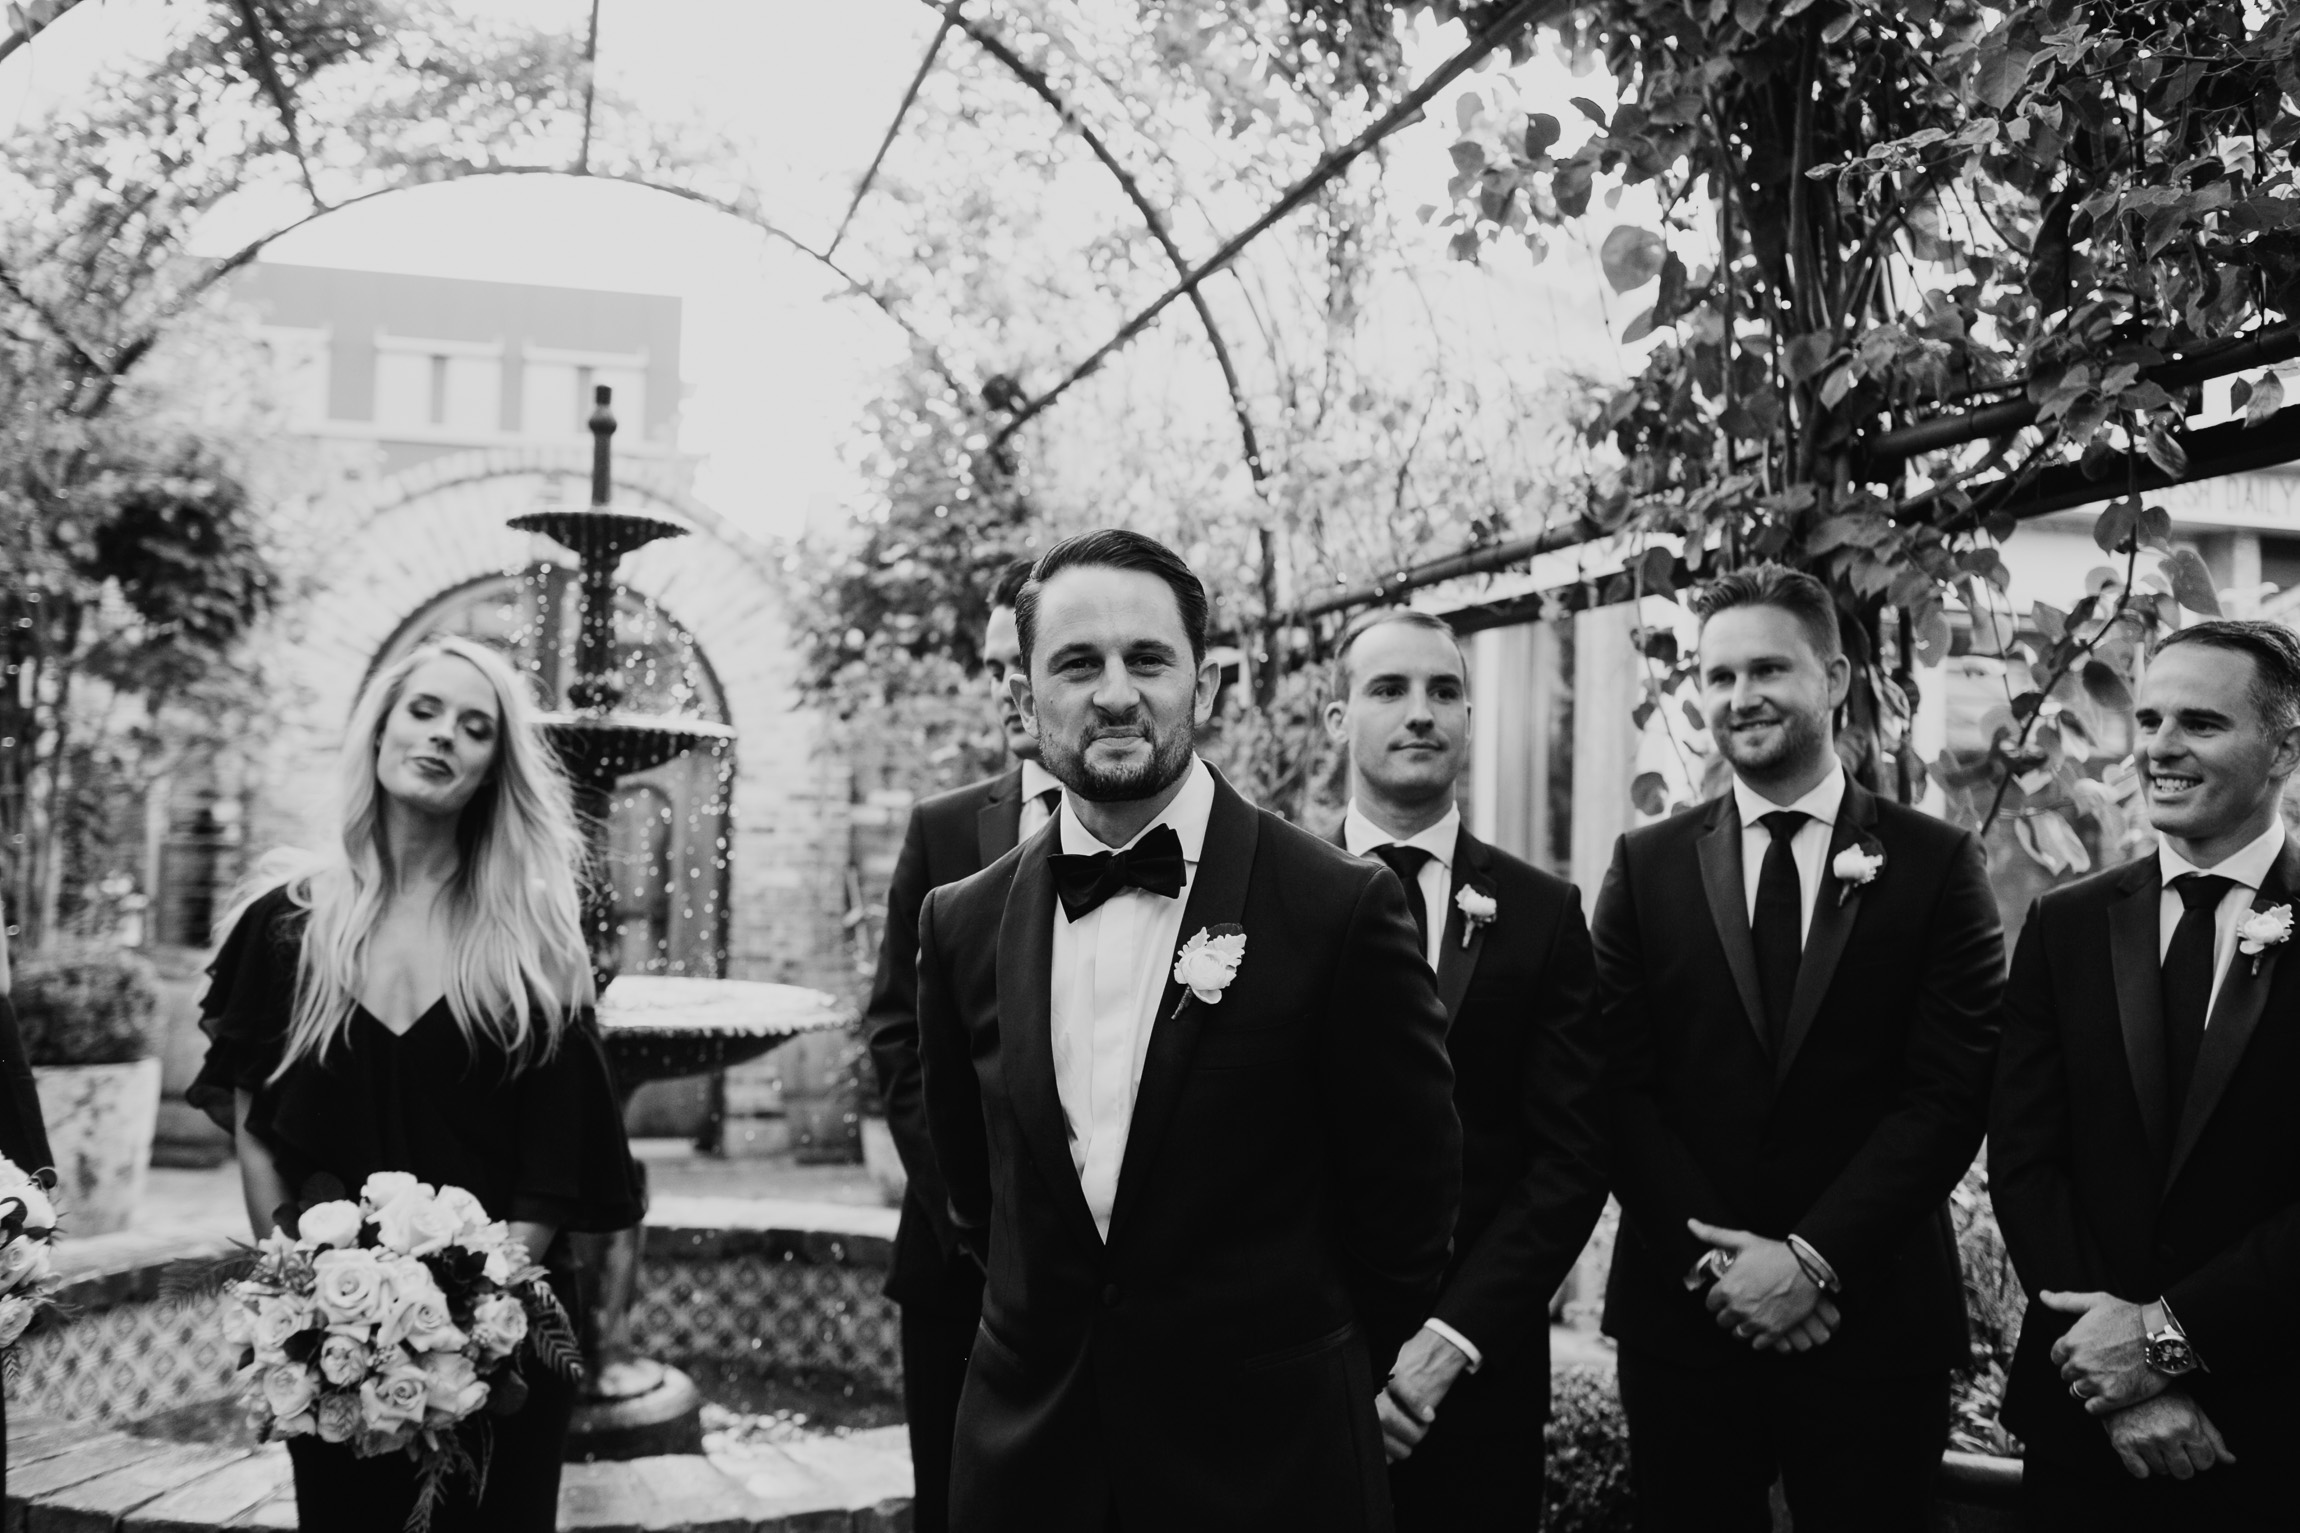 180223_justinaaron_wedding_charlotte_david_h-98.jpg